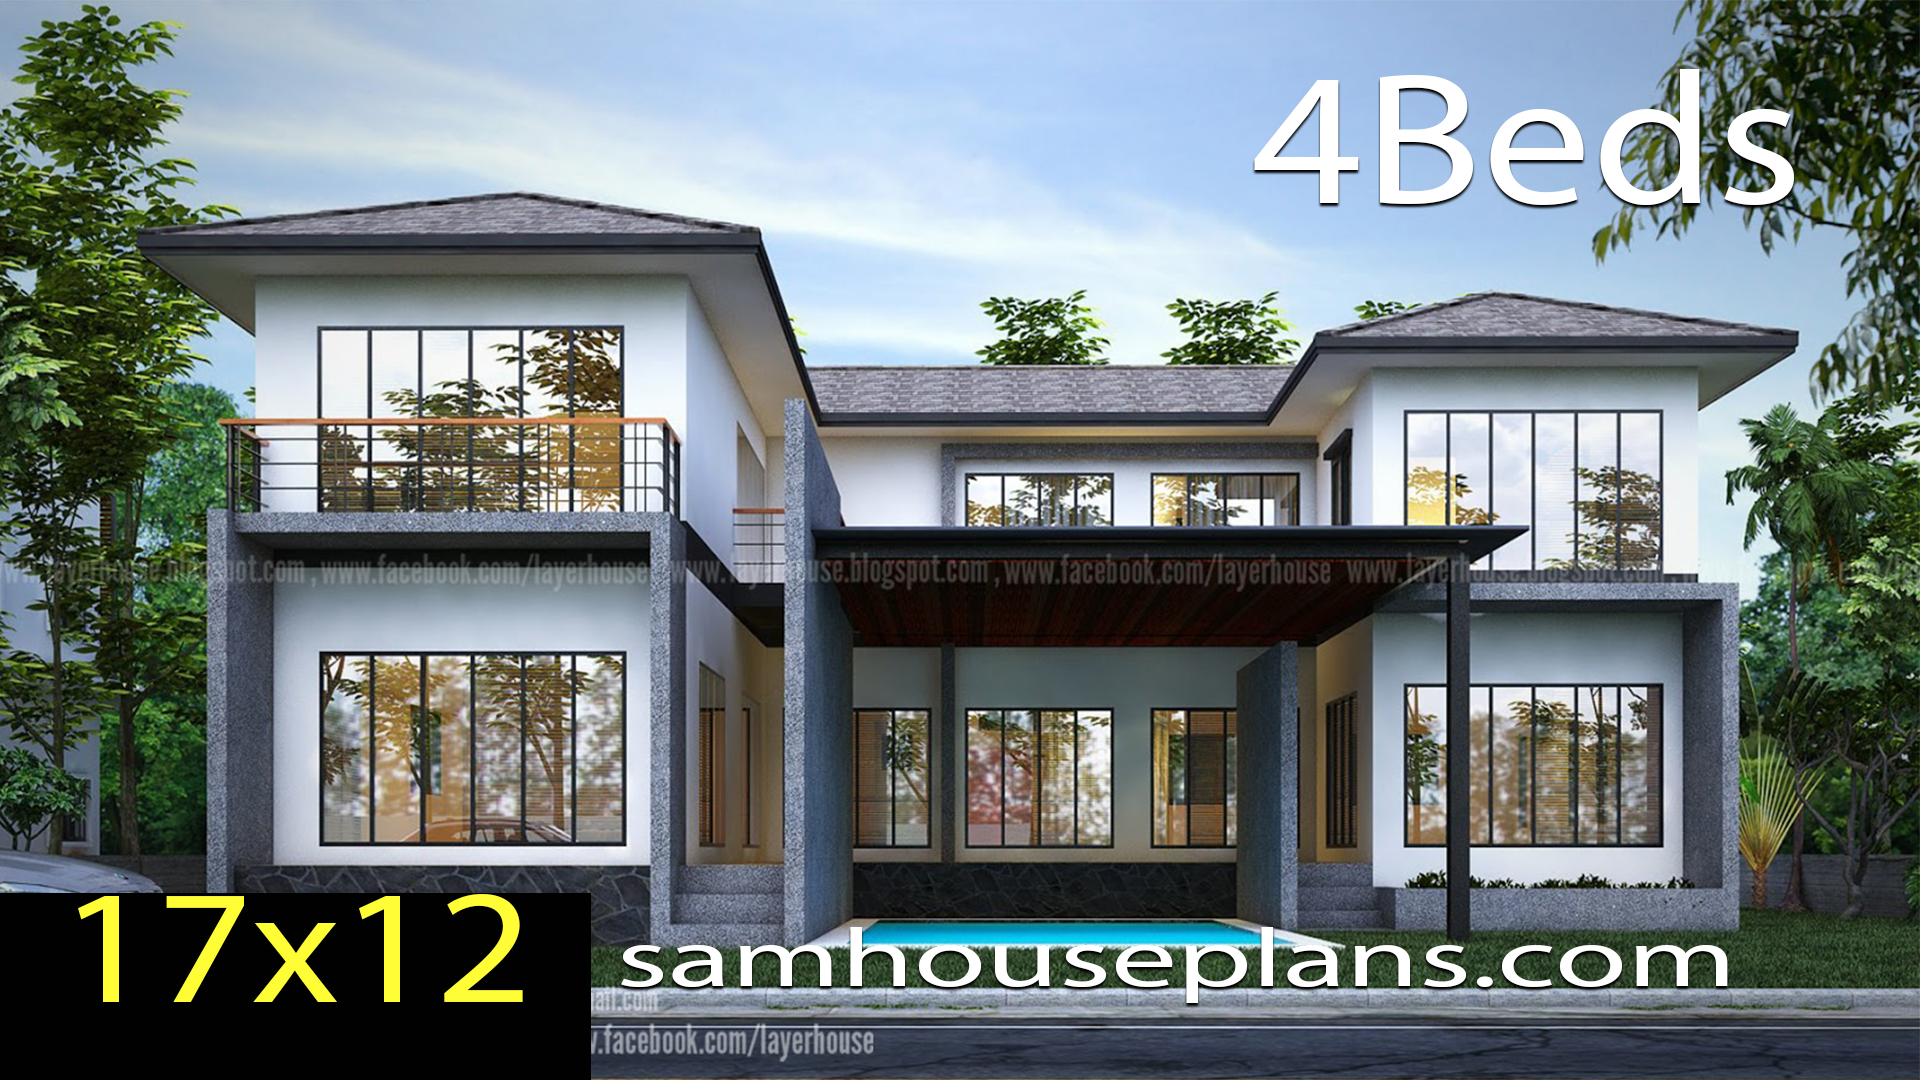 House Plans Idea 17x12 m with 4 bedrooms - Sam House Plans